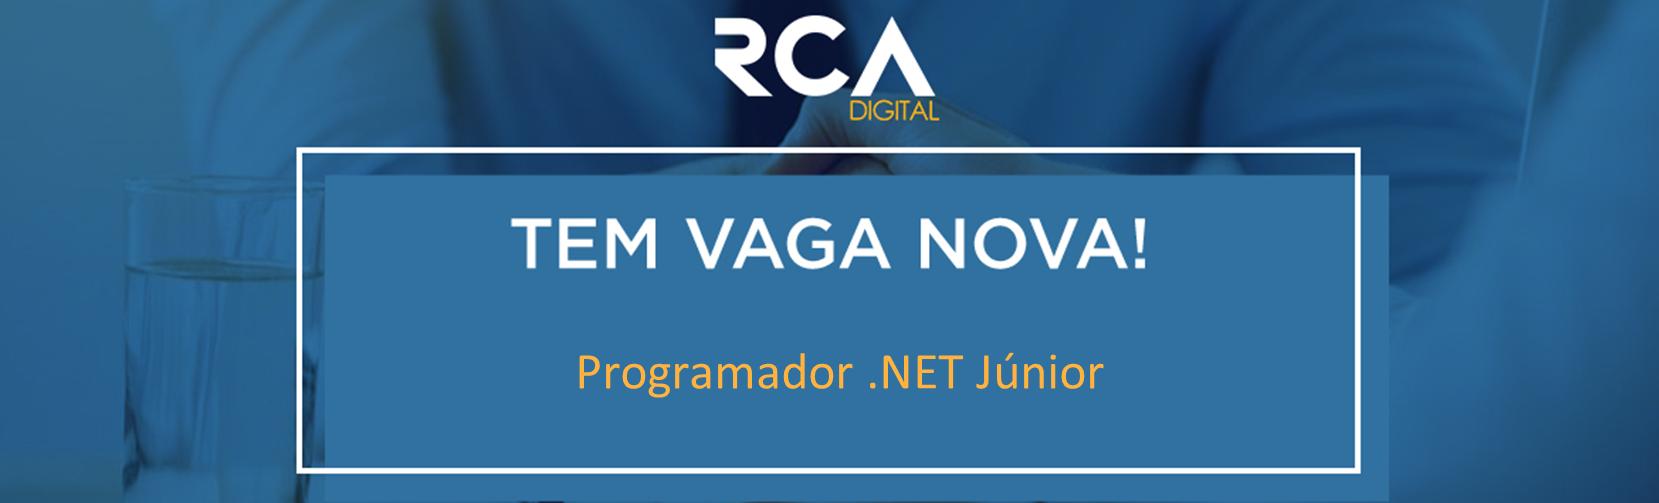 [RCA] - Programador .NET Júnior